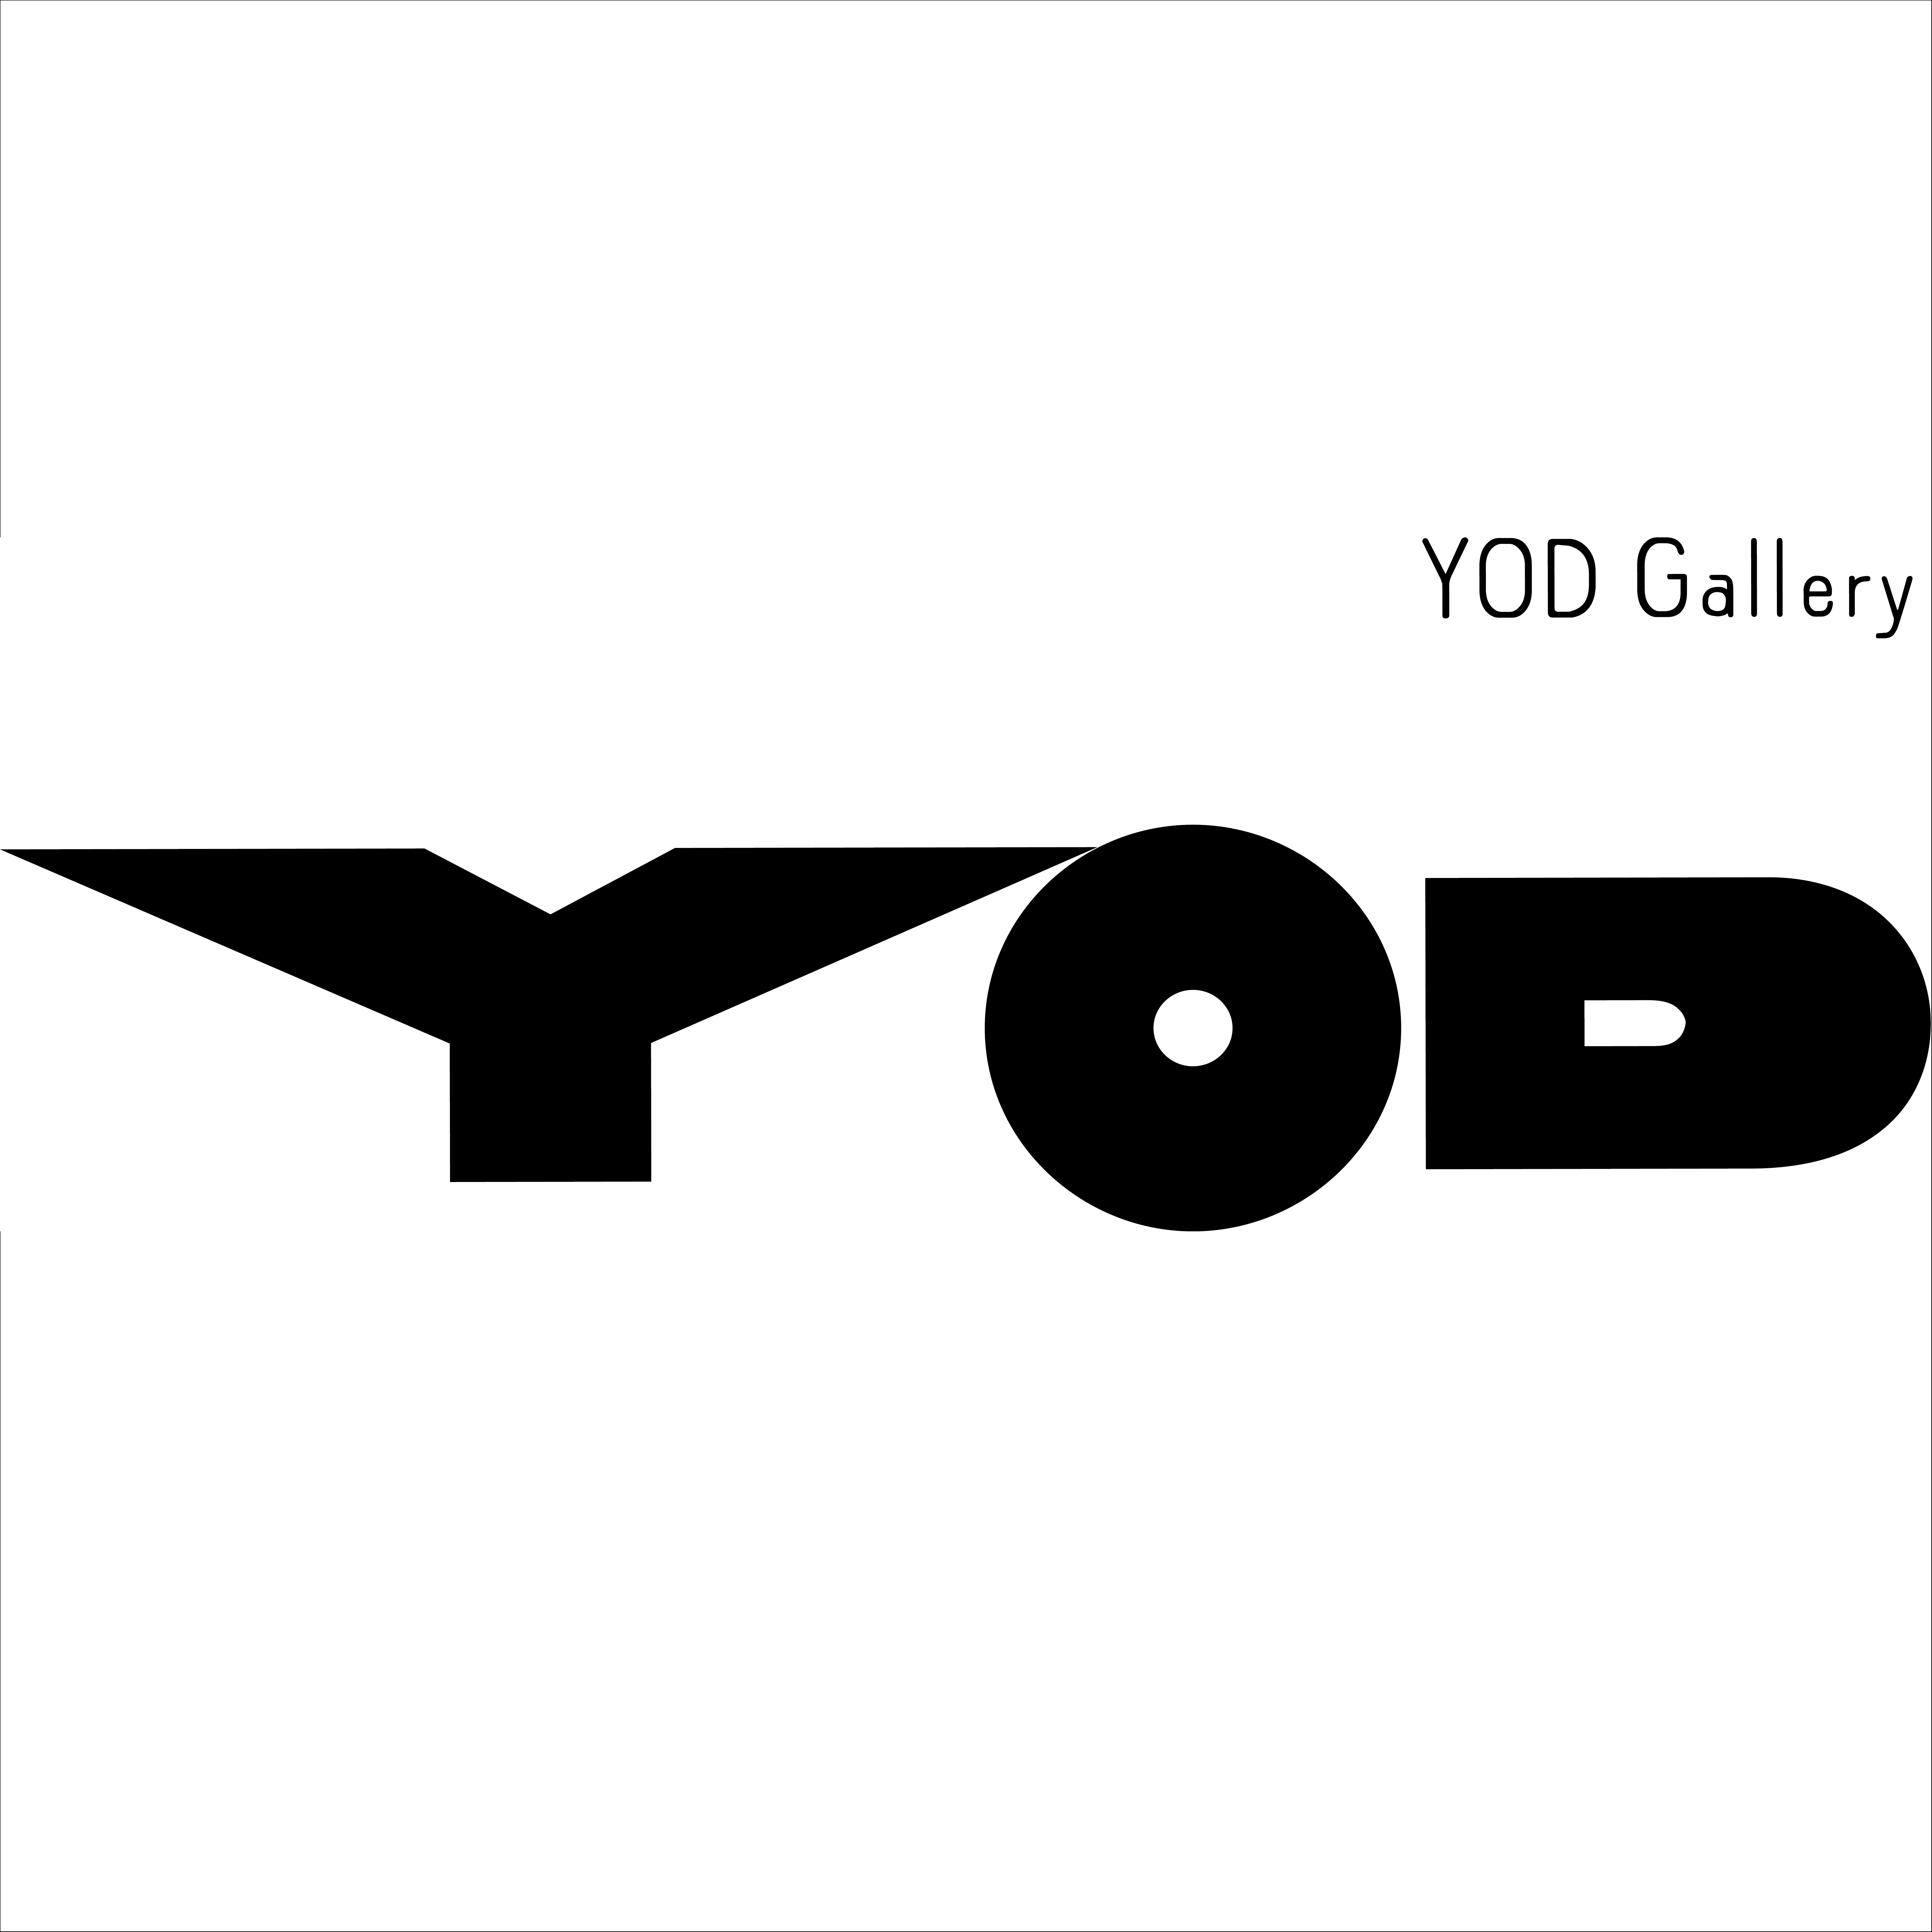 YOD Gallery